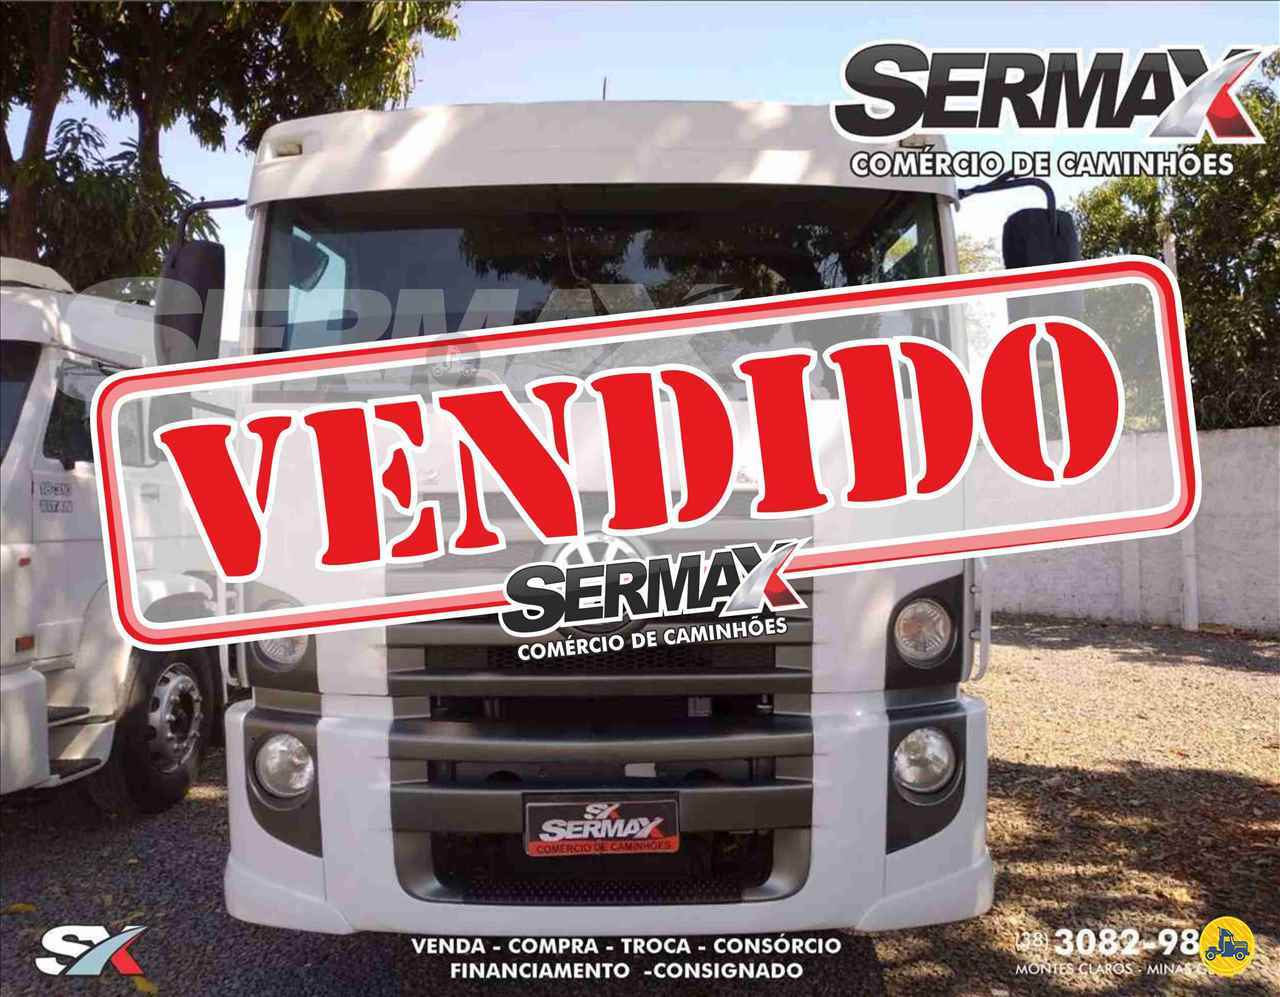 CAMINHAO VOLKSWAGEN VW 24280 Chassis Truck 6x2 Sermax Caminhões MONTES CLAROS MINAS GERAIS MG